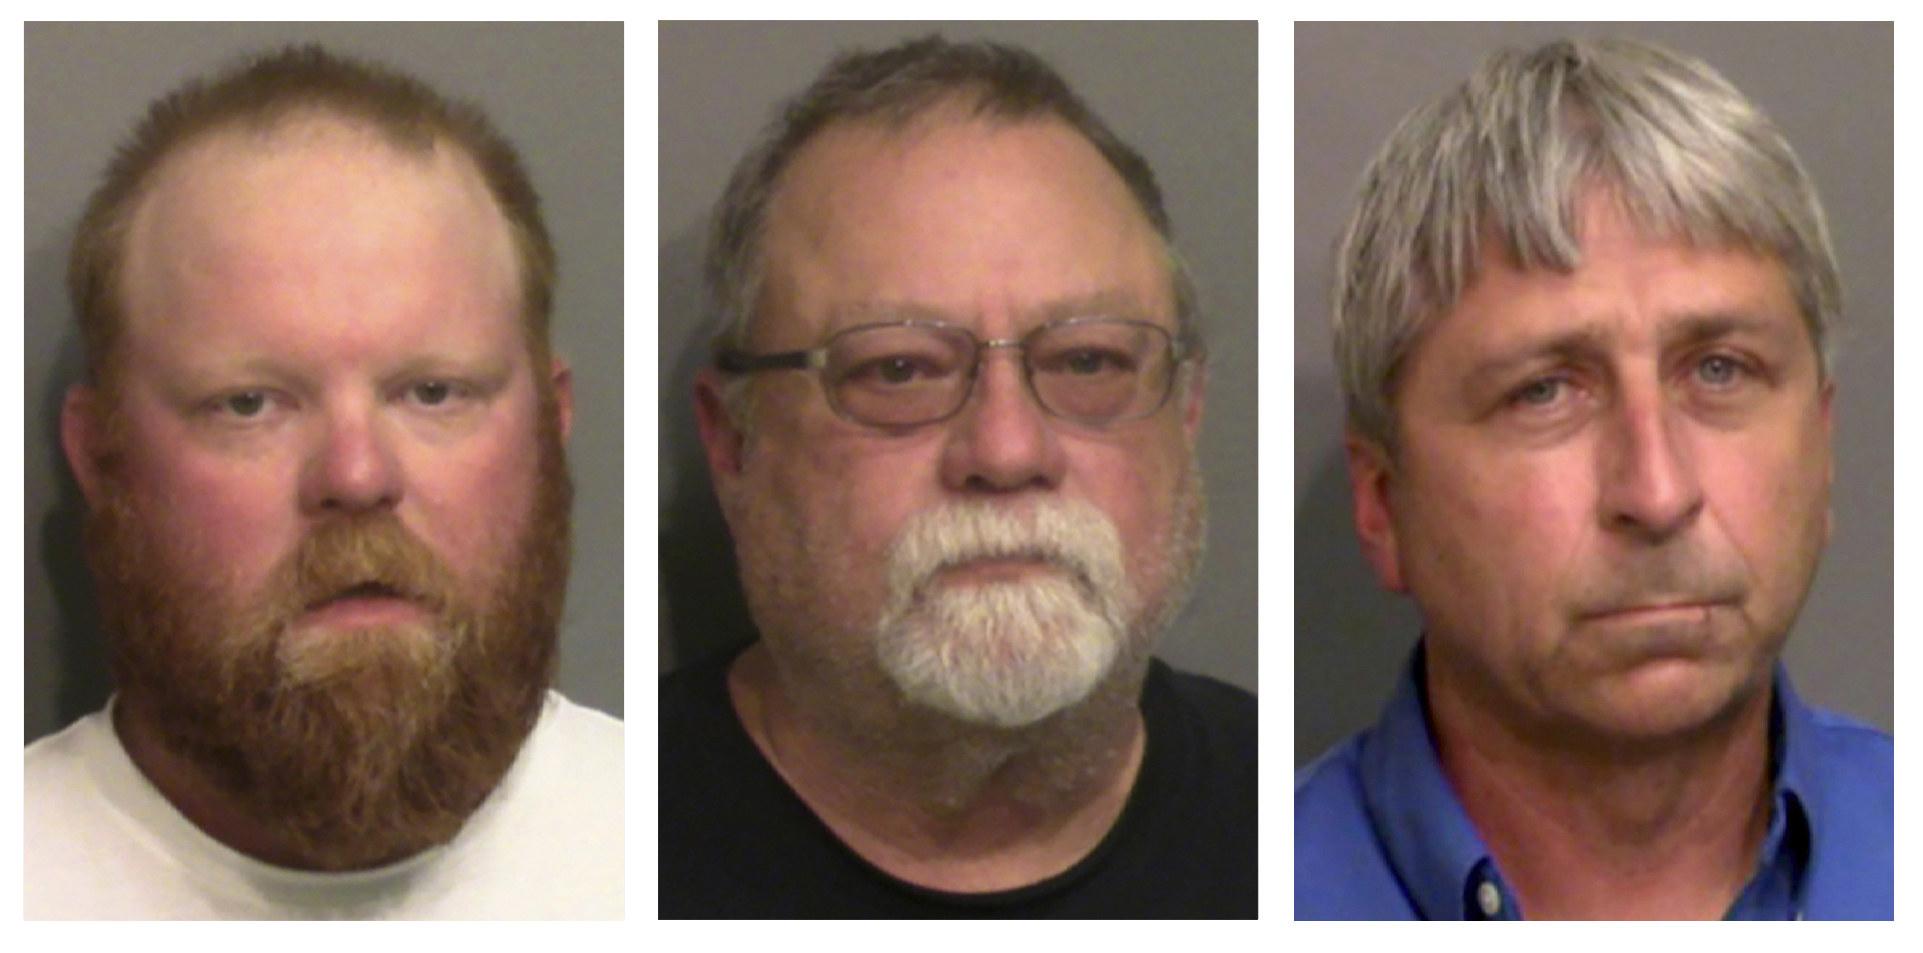 Mugshots of three men